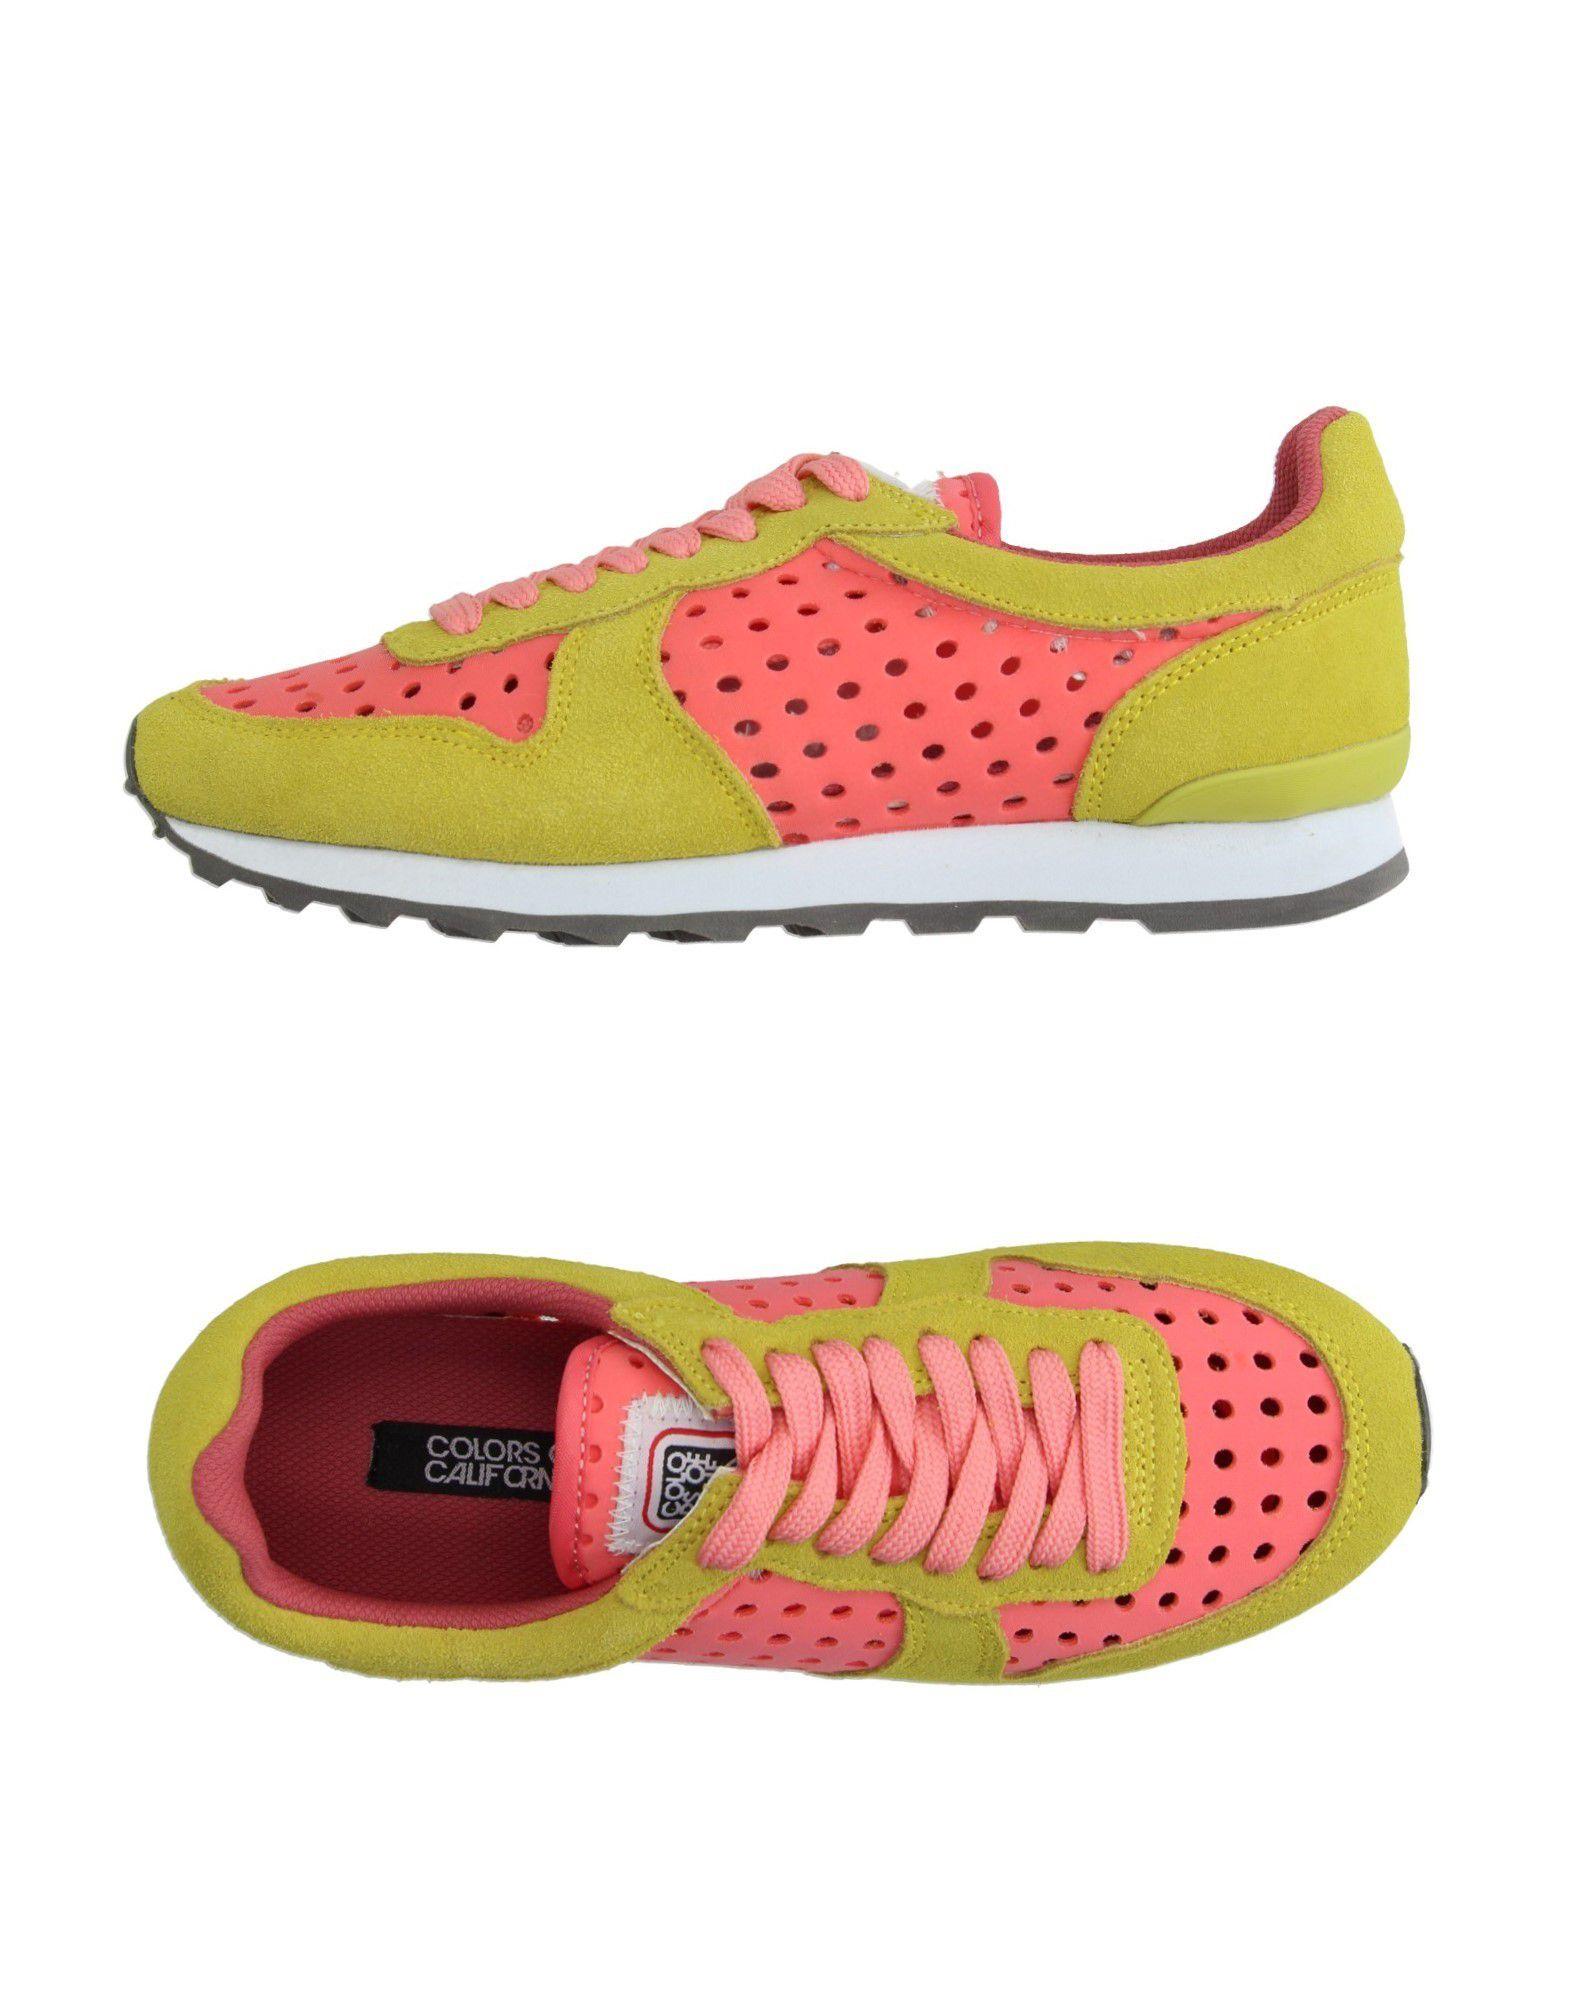 new arrival 7af78 632d9 COLORS OF CALIFORNIA Sneakers - Footwear | YOOX.COM